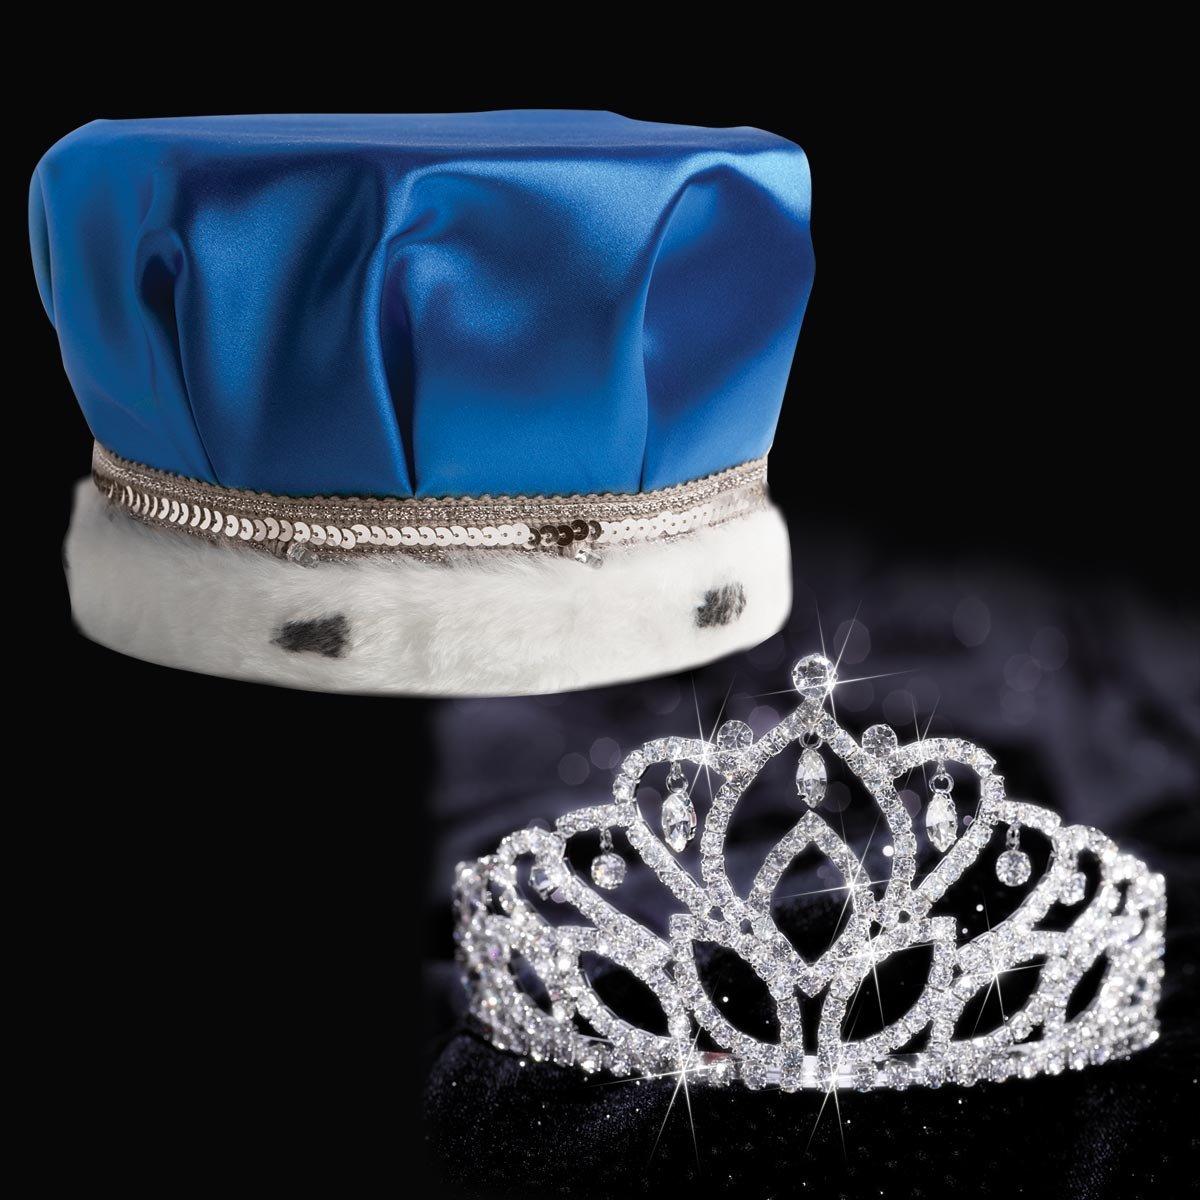 Blue Satin Crown Royalty Set, Blue Satin Crown with Silver Band, White Fur and 2 7/8 inch High Mirabella Tiara